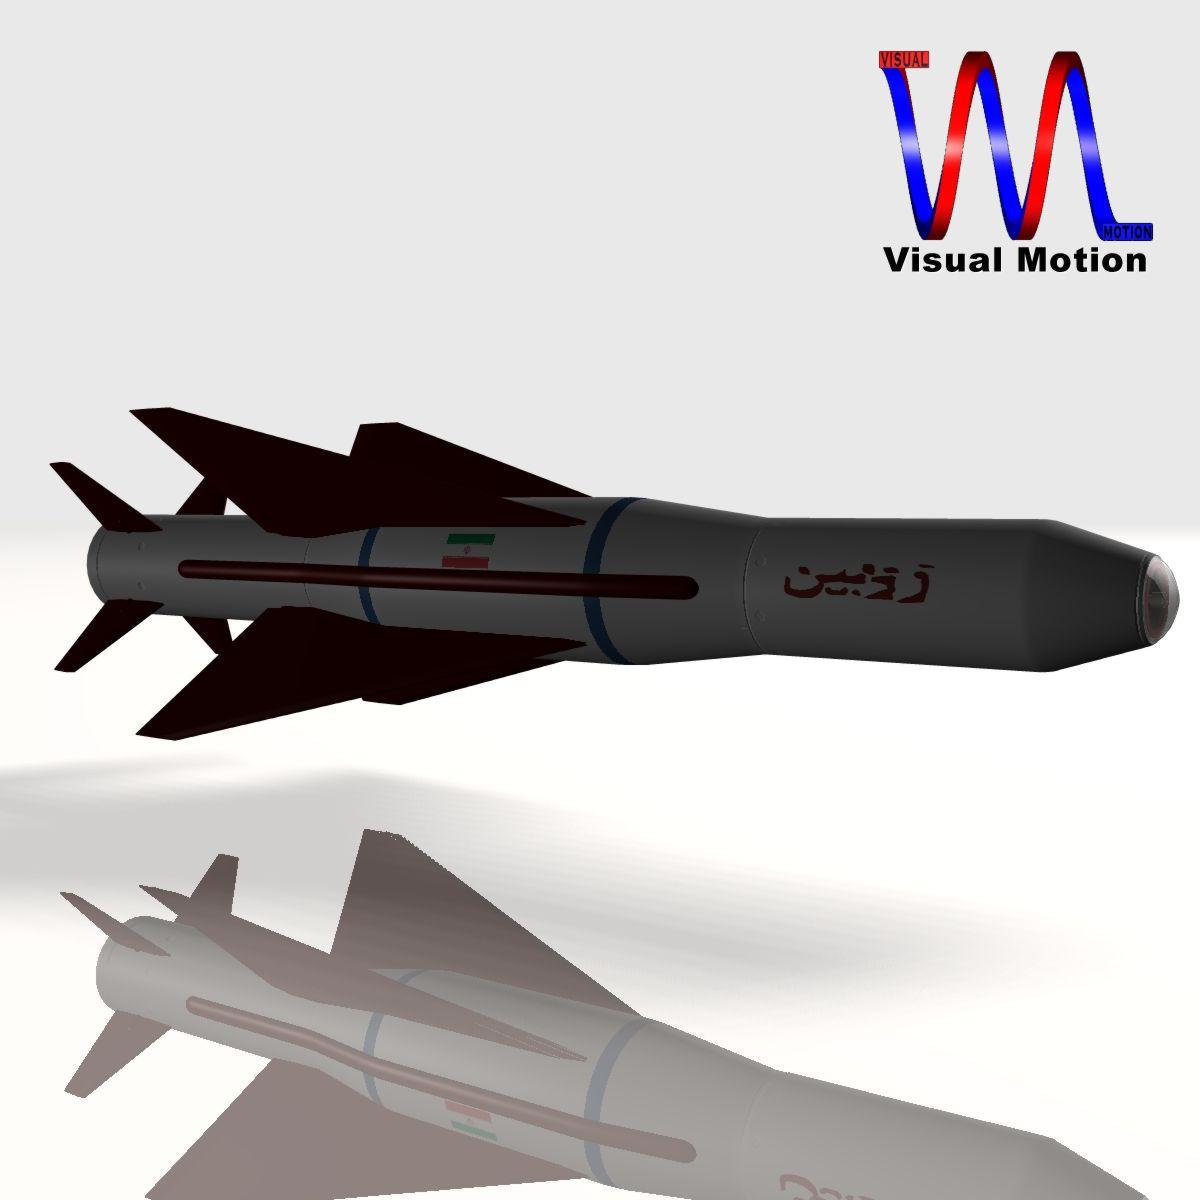 iranian agm-379 zoobin asm missile 3d model 3ds dxf fbx blend cob dae x obj 150579